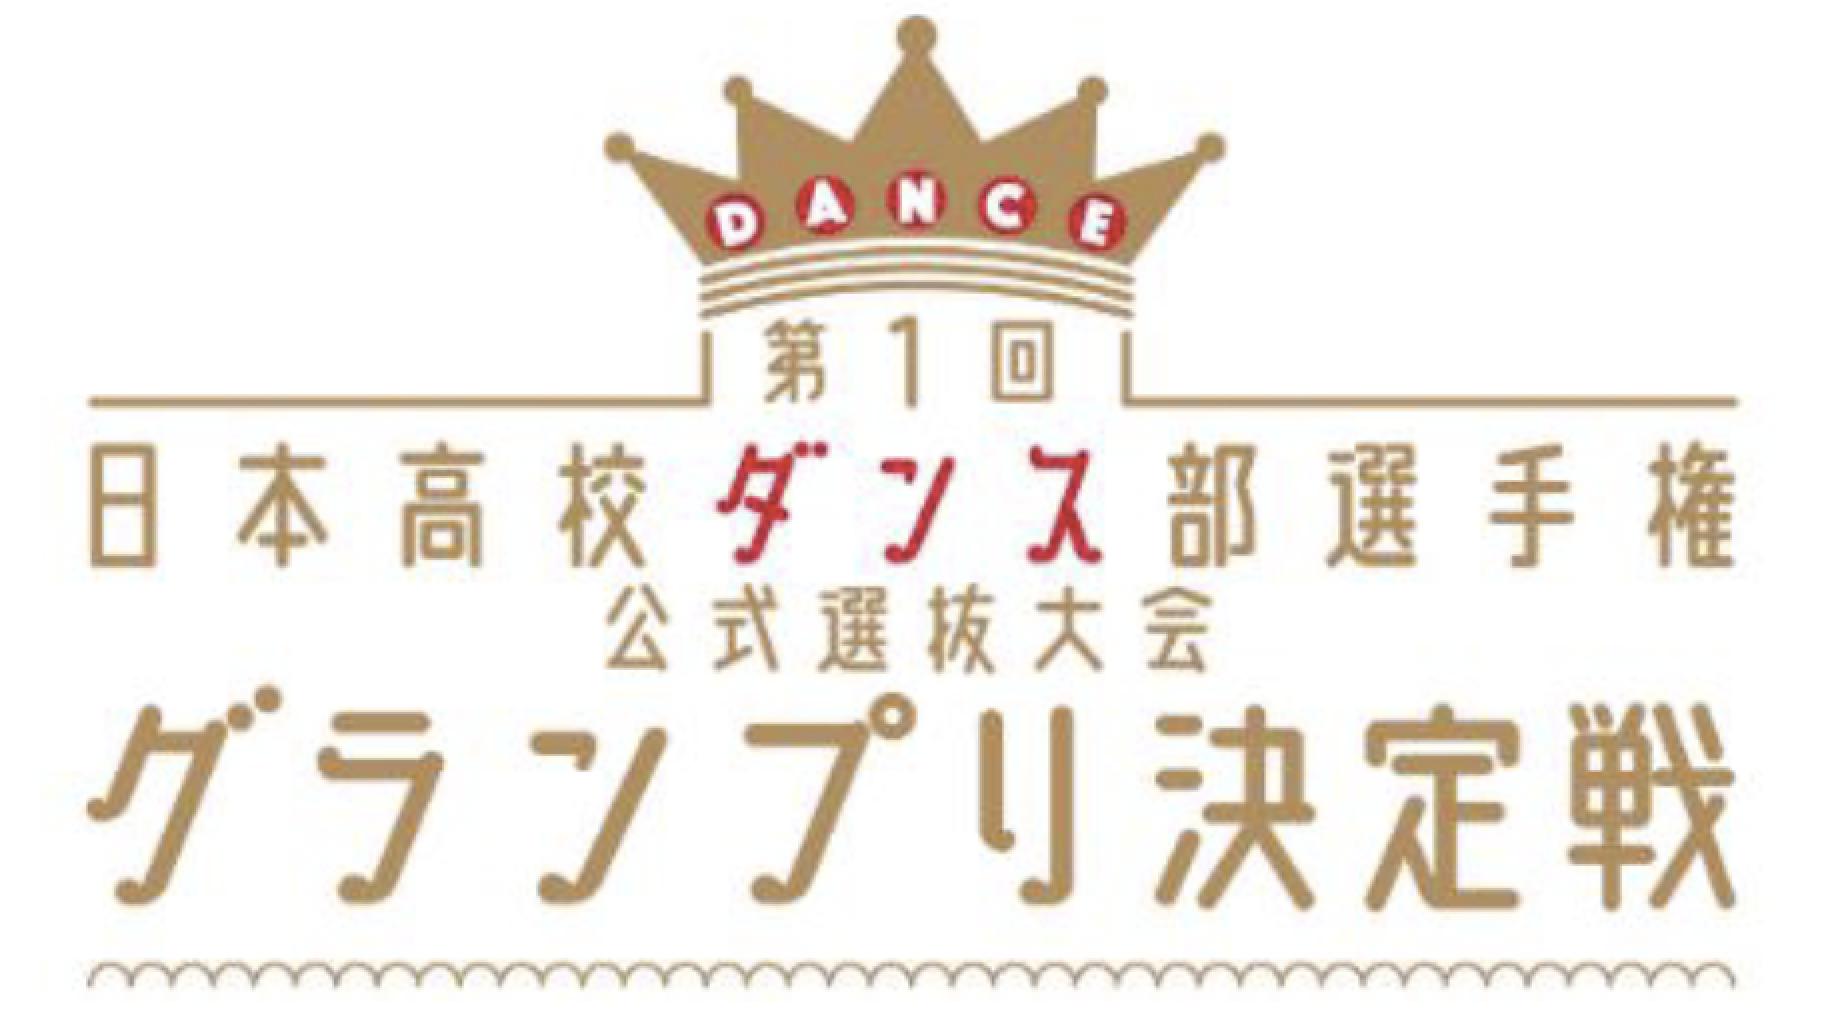 dancegpx